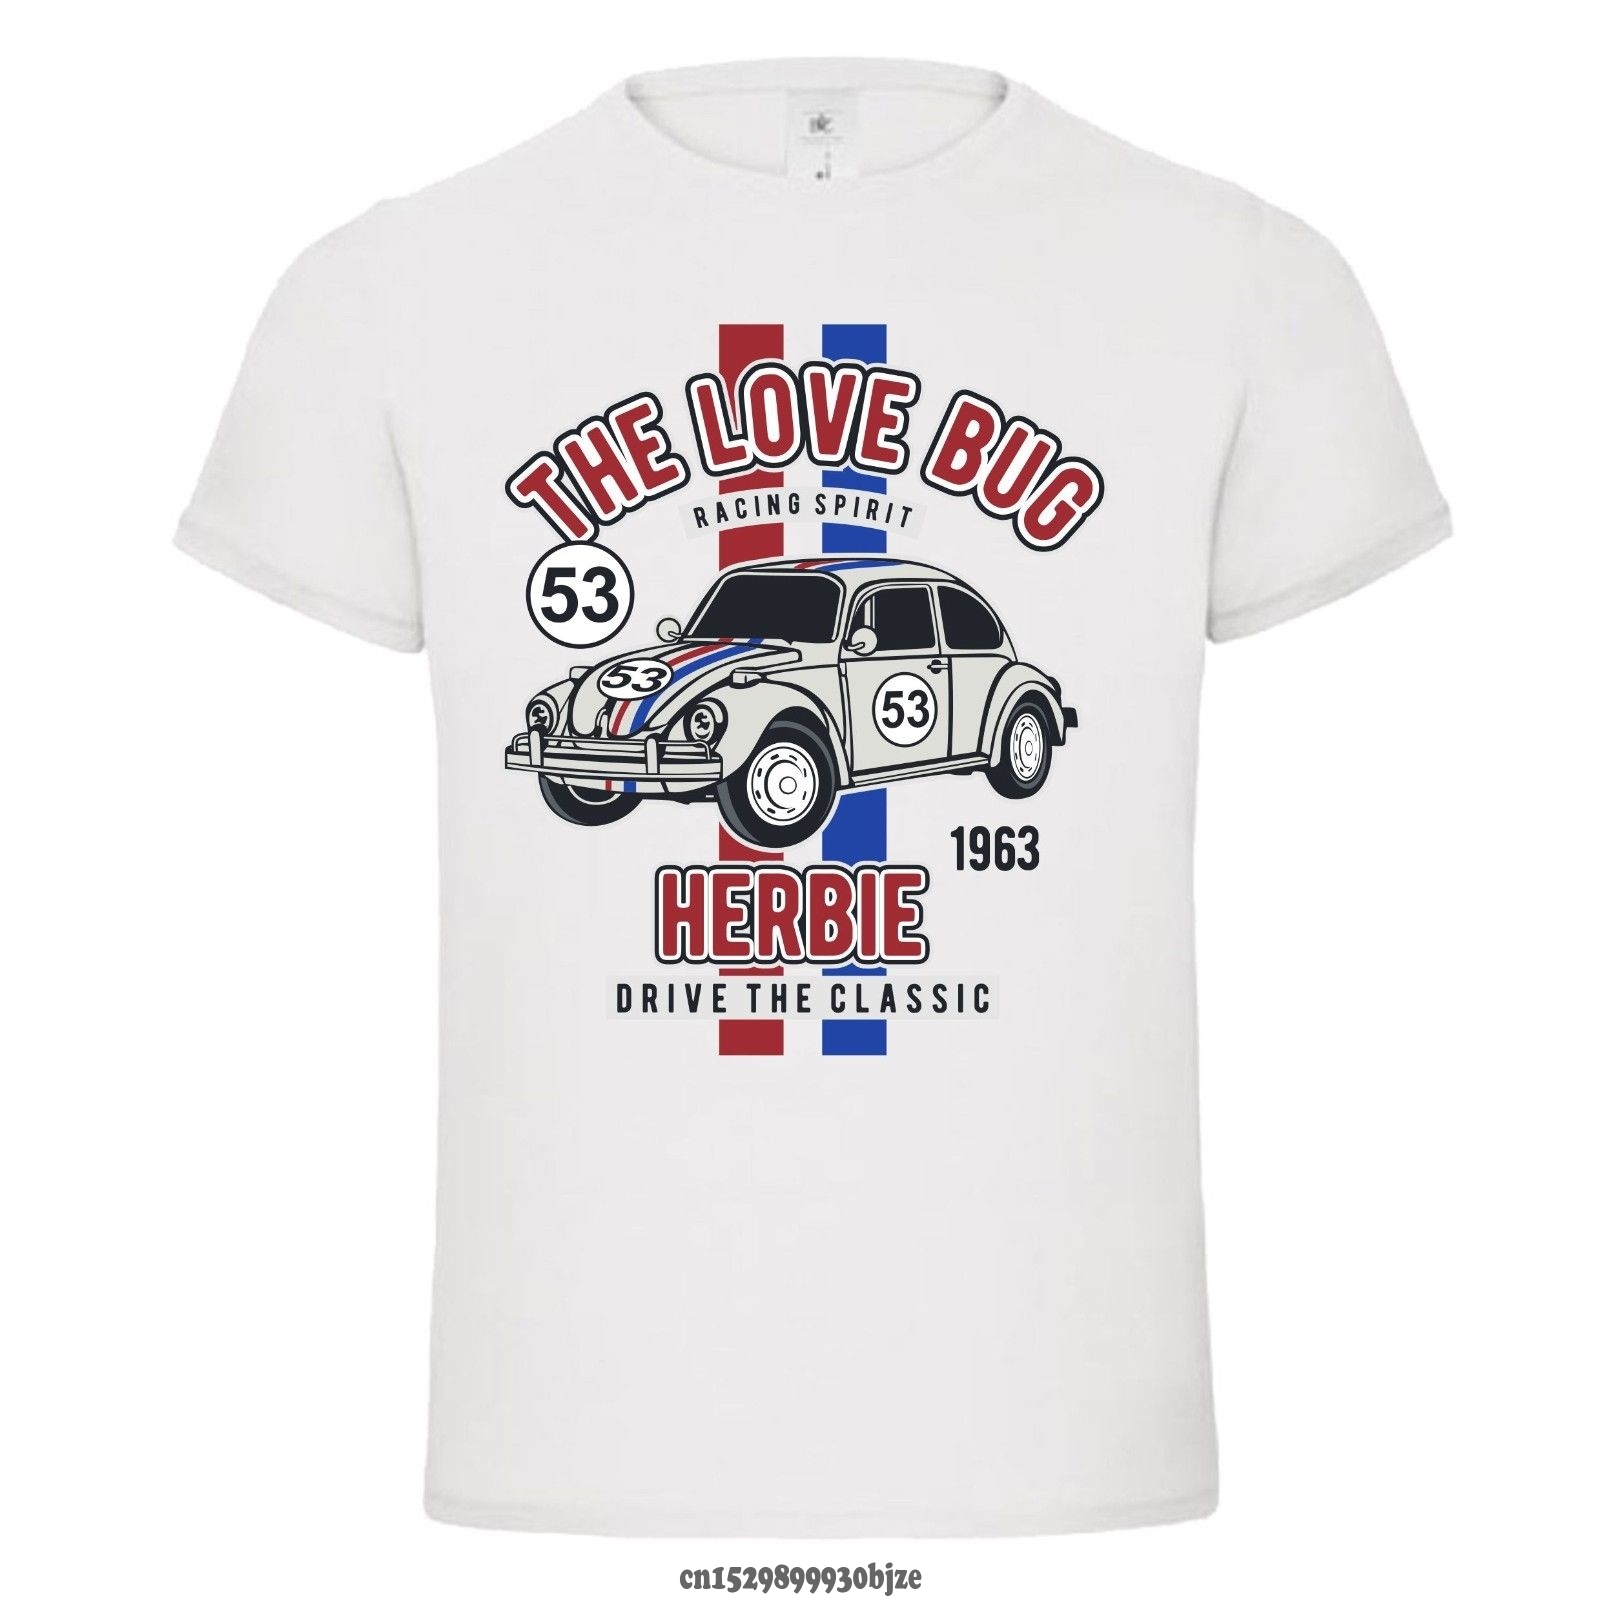 Men's T-shirt Cartoon Fun THE LOVE BUG Herbie 53 Fashion Classic Mashup Mens NEW 2020 Man's T-shirt